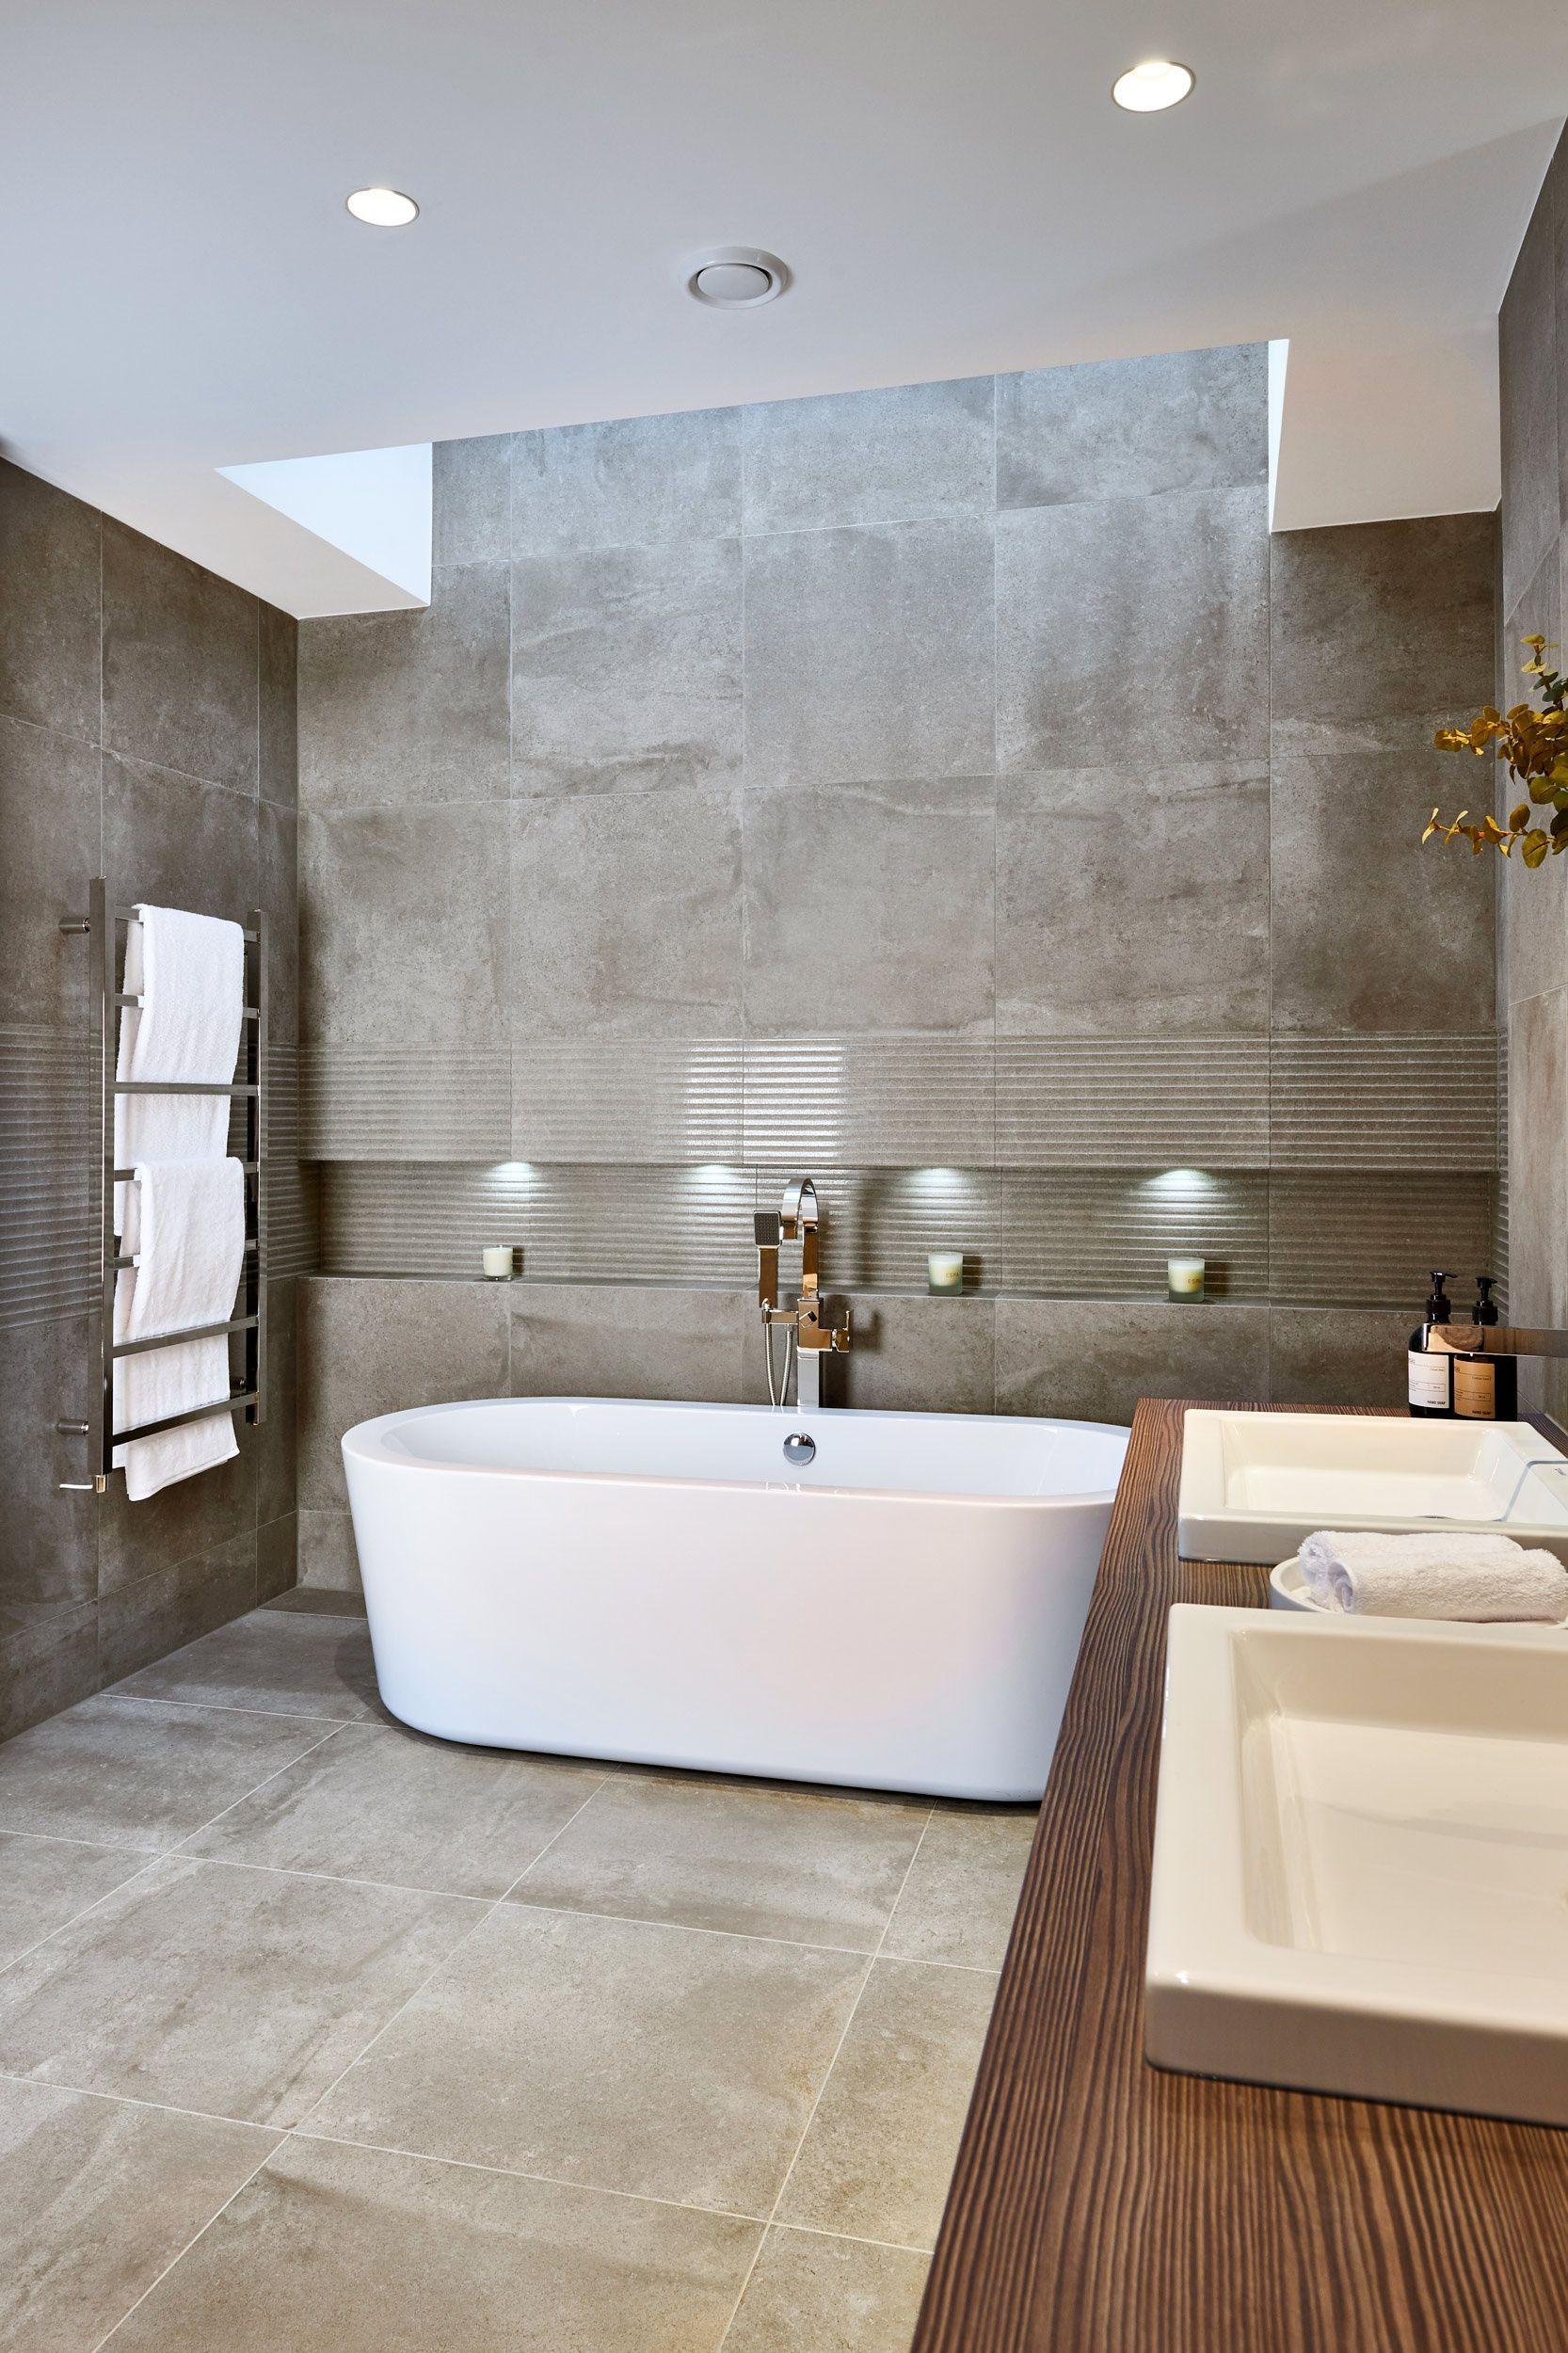 Completo Amalfi 11943 Italianbathroomdesign Italian Bathroom Design Bathroom Interior Contemporary Bathroom Designs